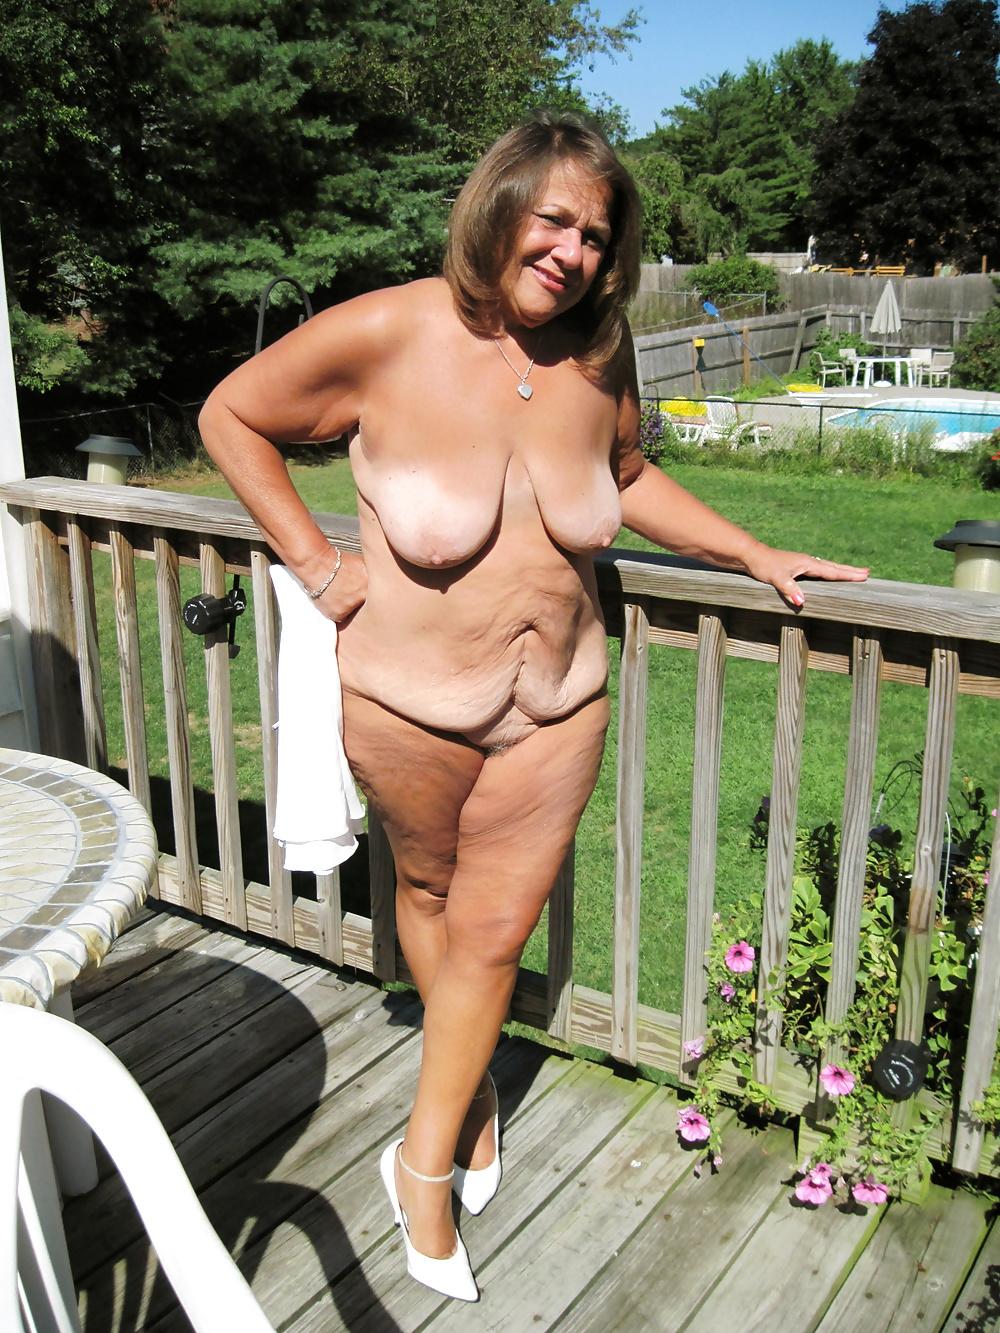 Granny bikini slut pictures amatuer, nude asian wife masturbation